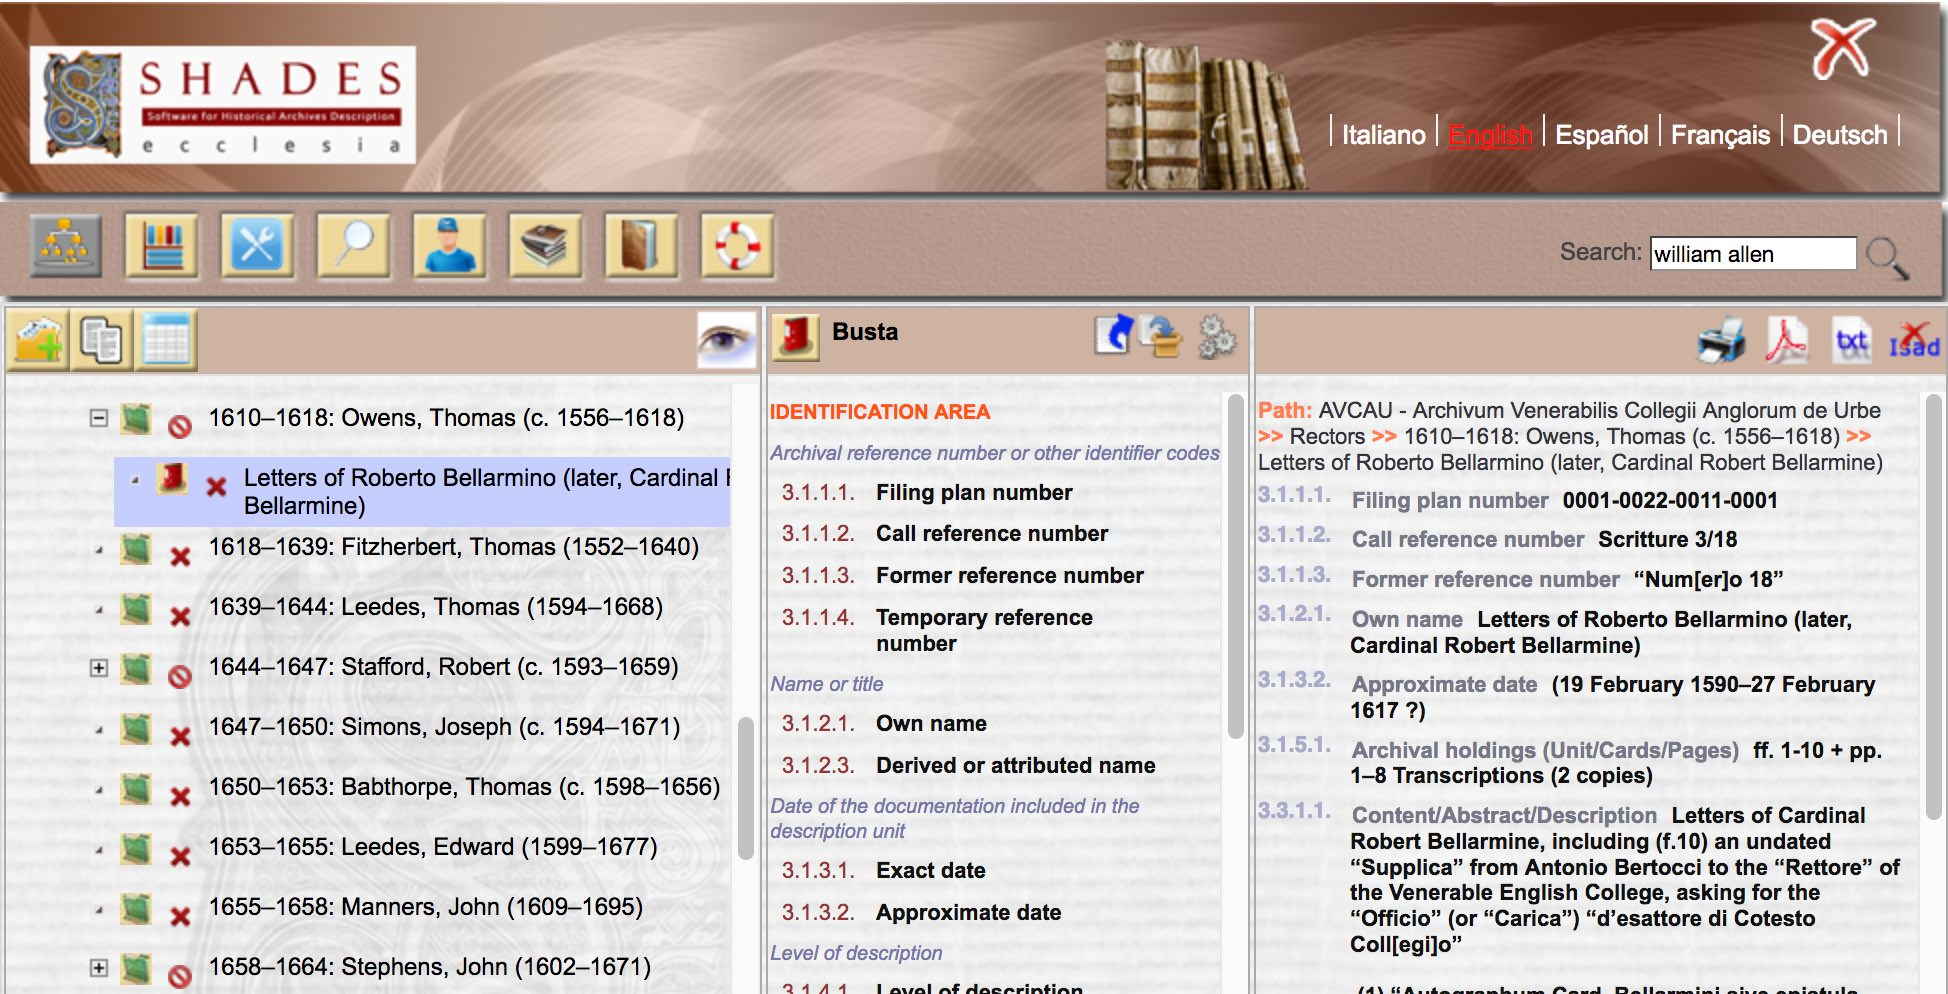 Screen-shot of a digital library catalogue